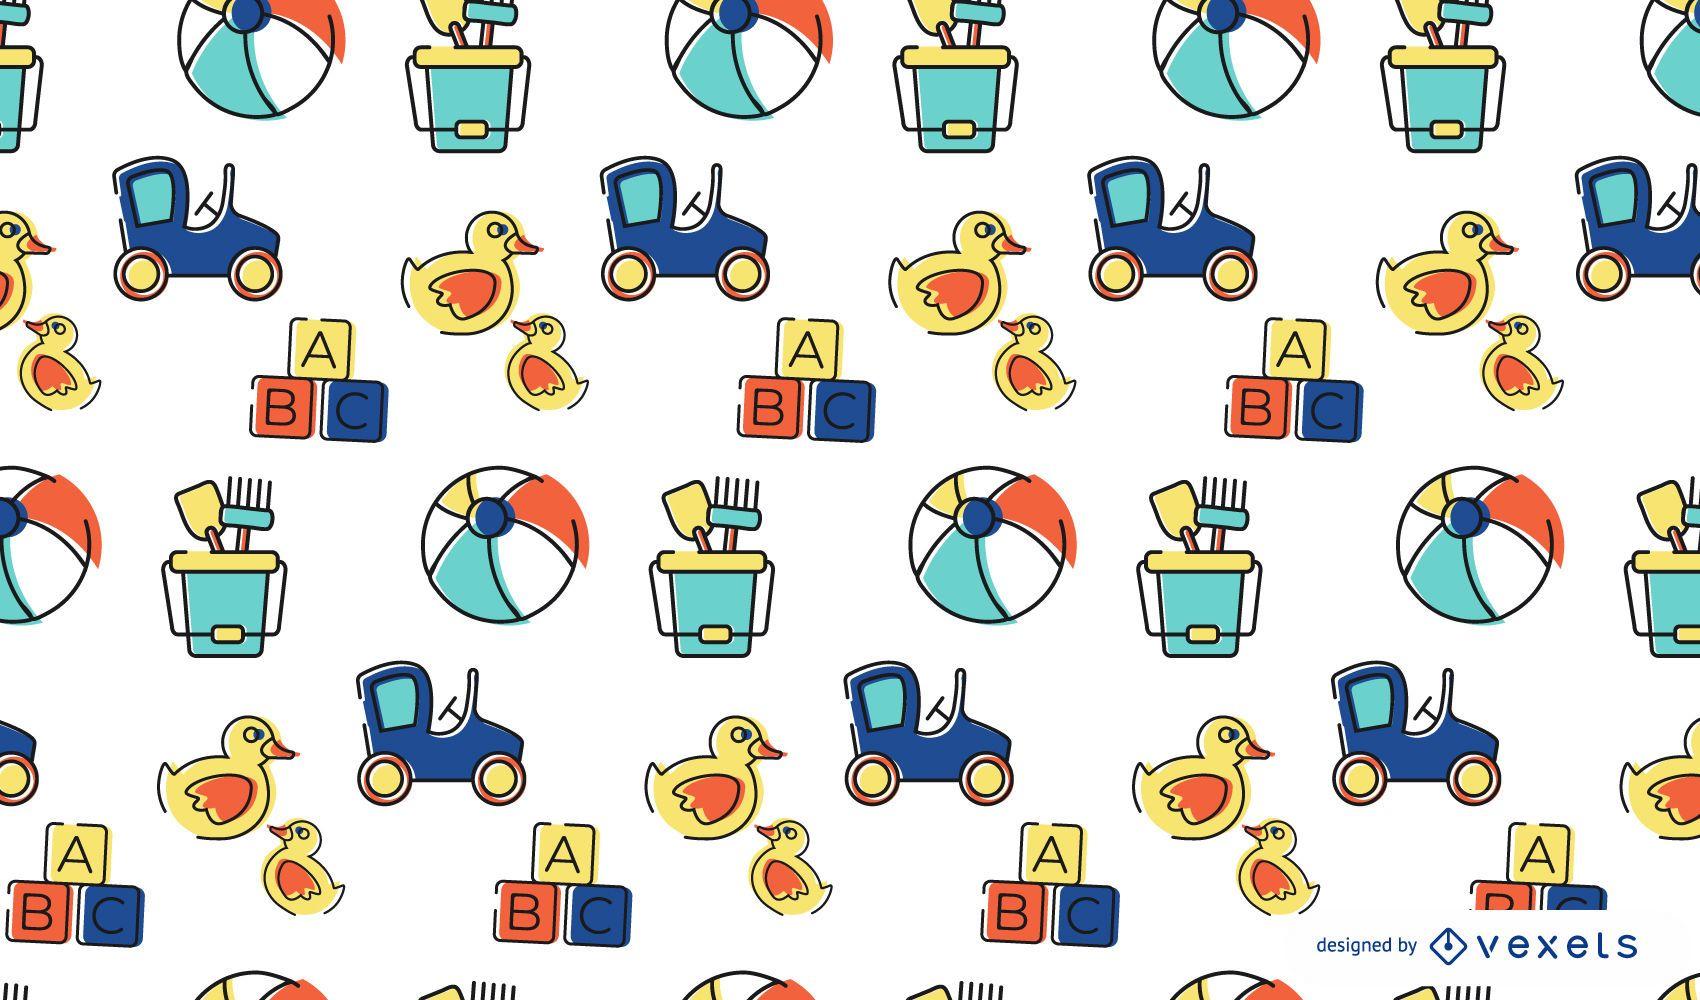 Colorful stroke toys pattern design